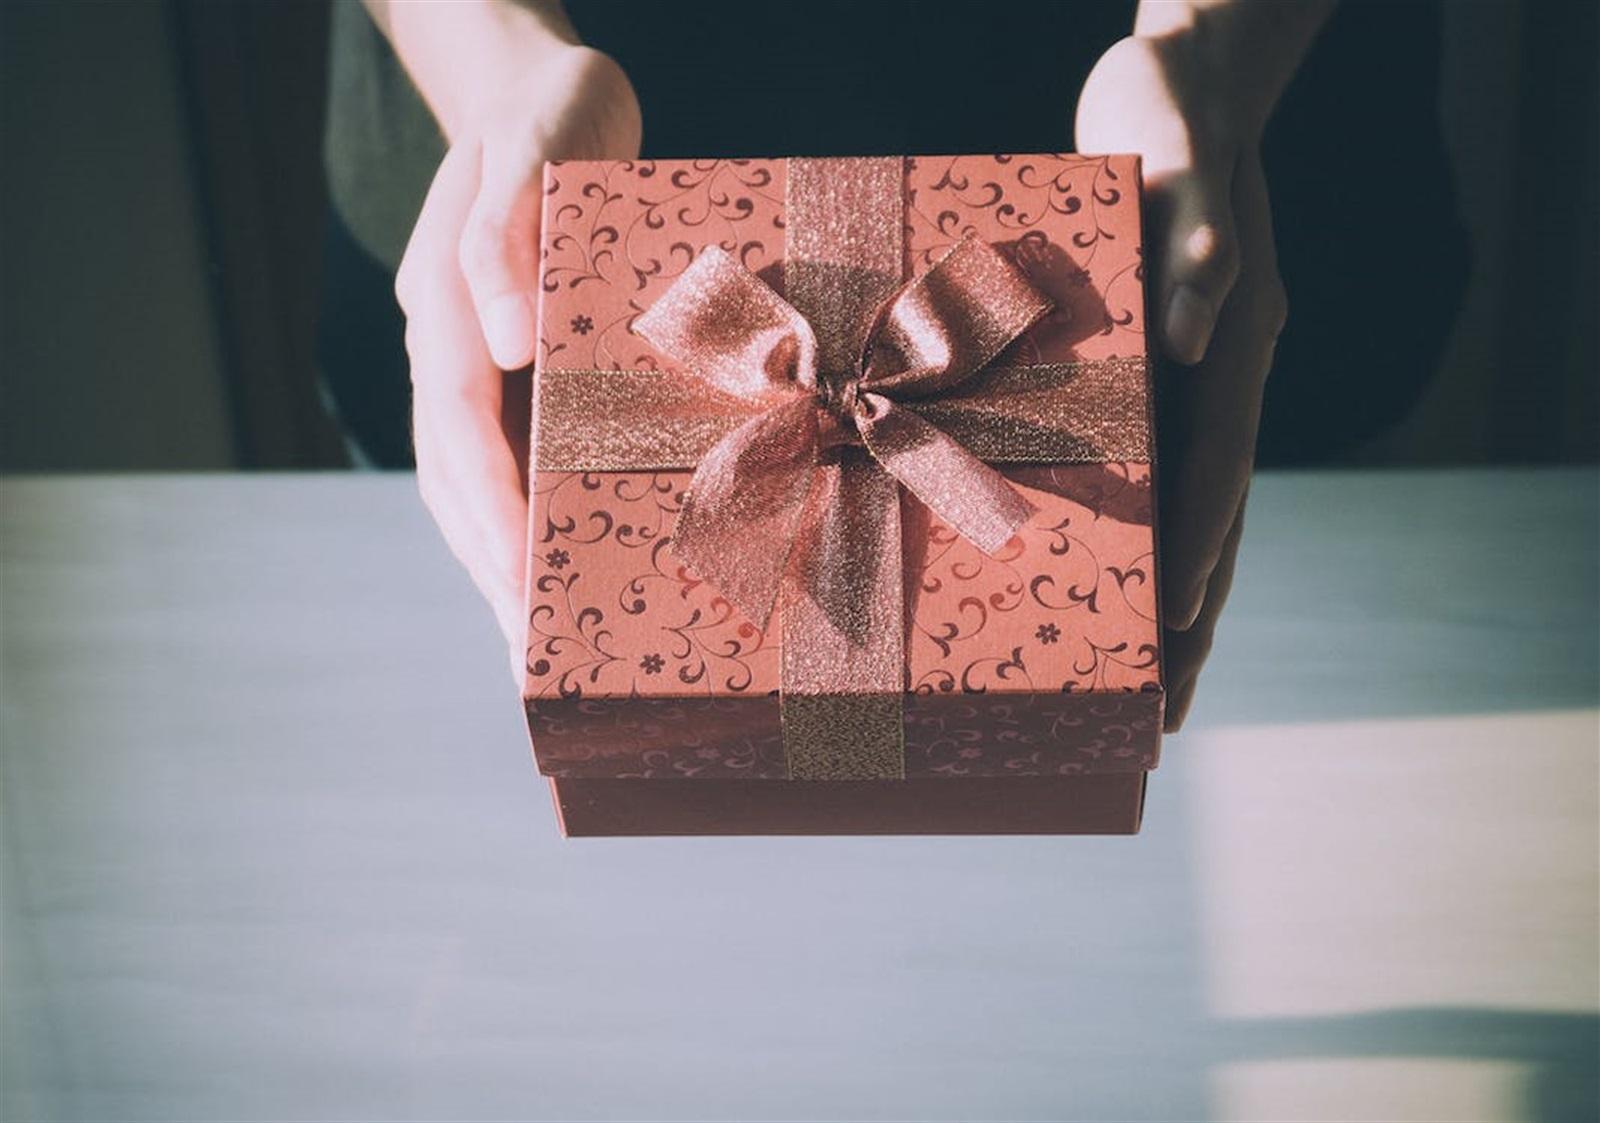 Alternative Seasonal Gift Ideas for Small Businesses